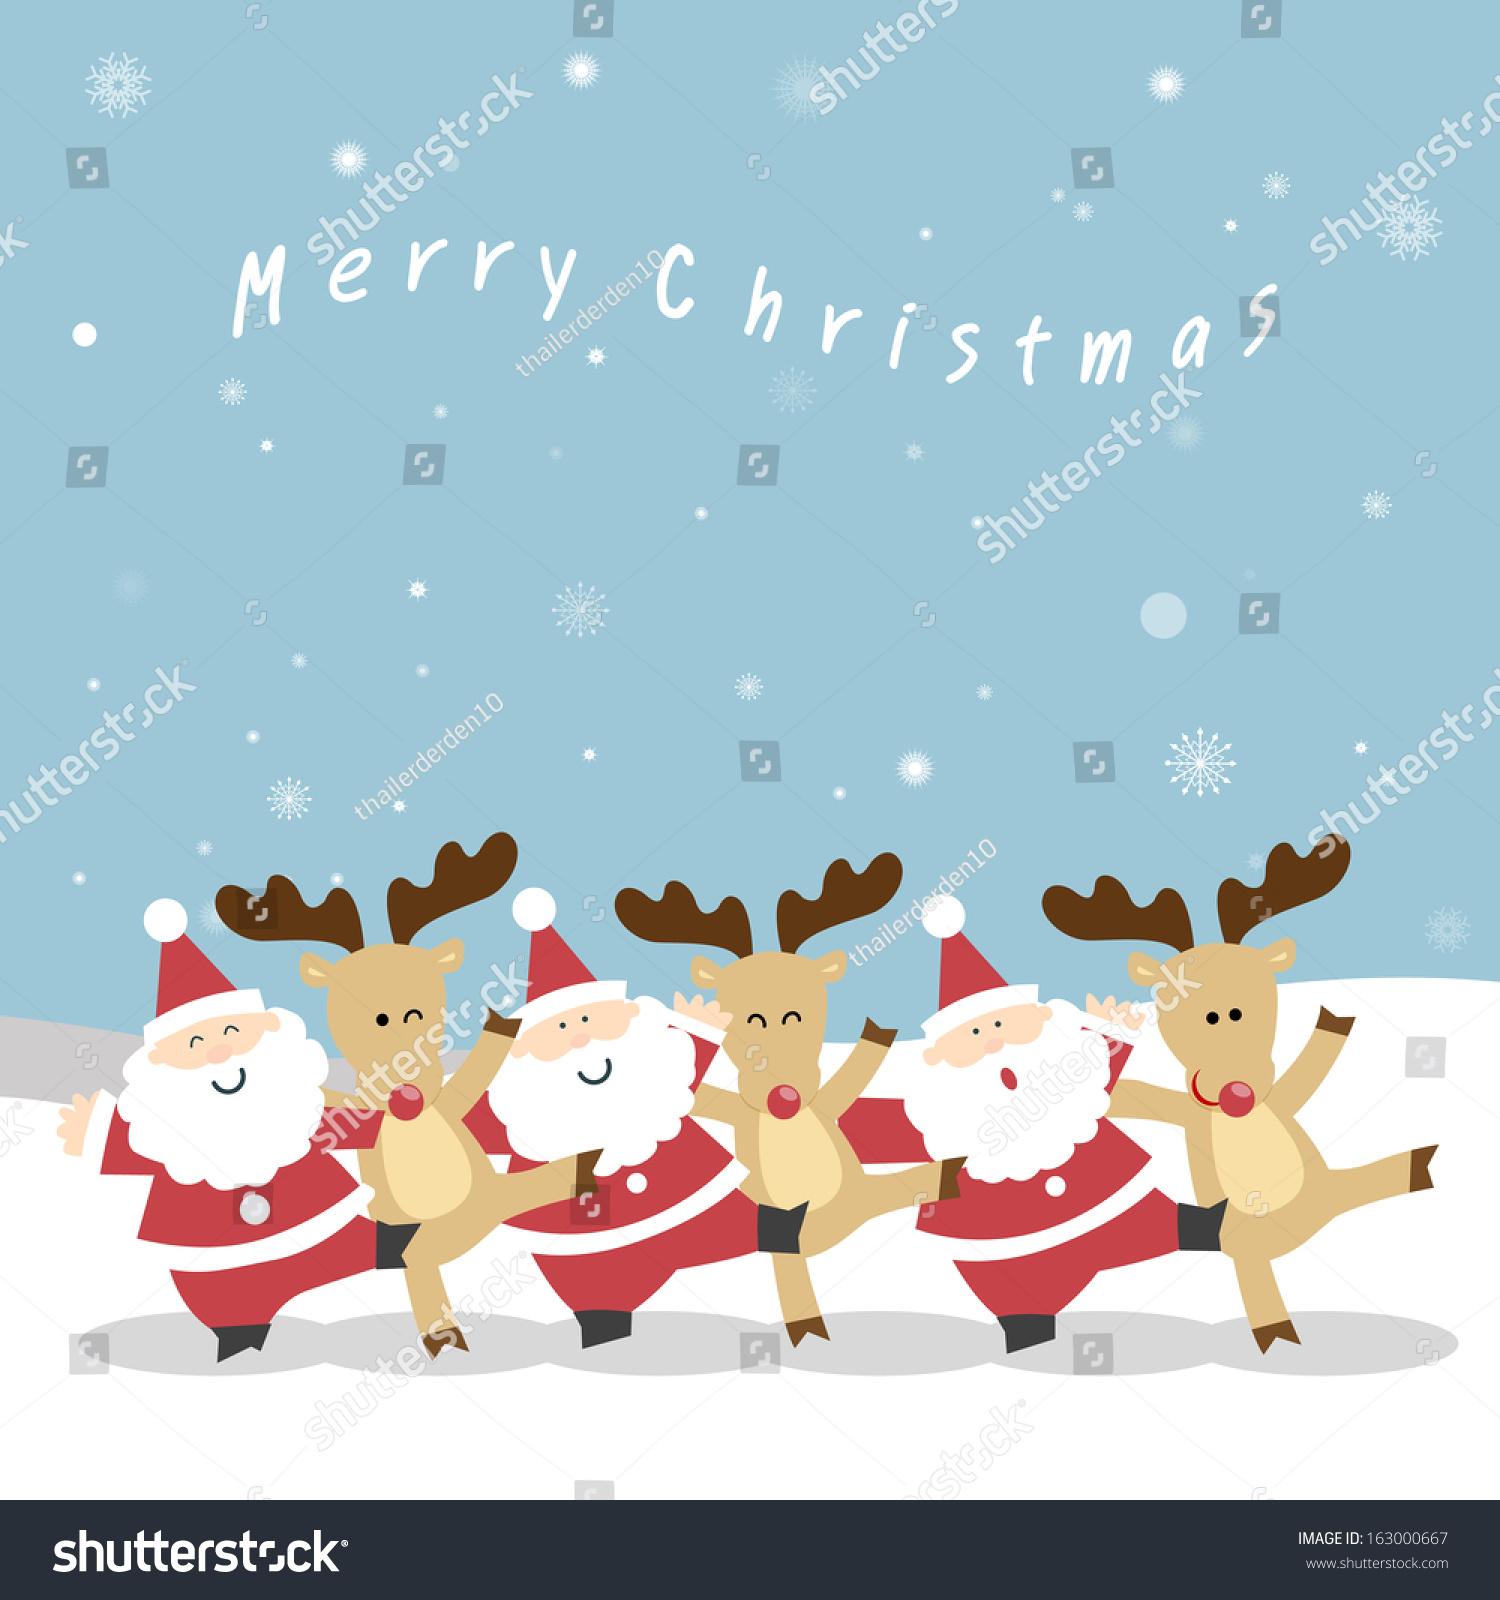 Santa Claus Reindeers Neck Playfully Dance Stock Vector ...